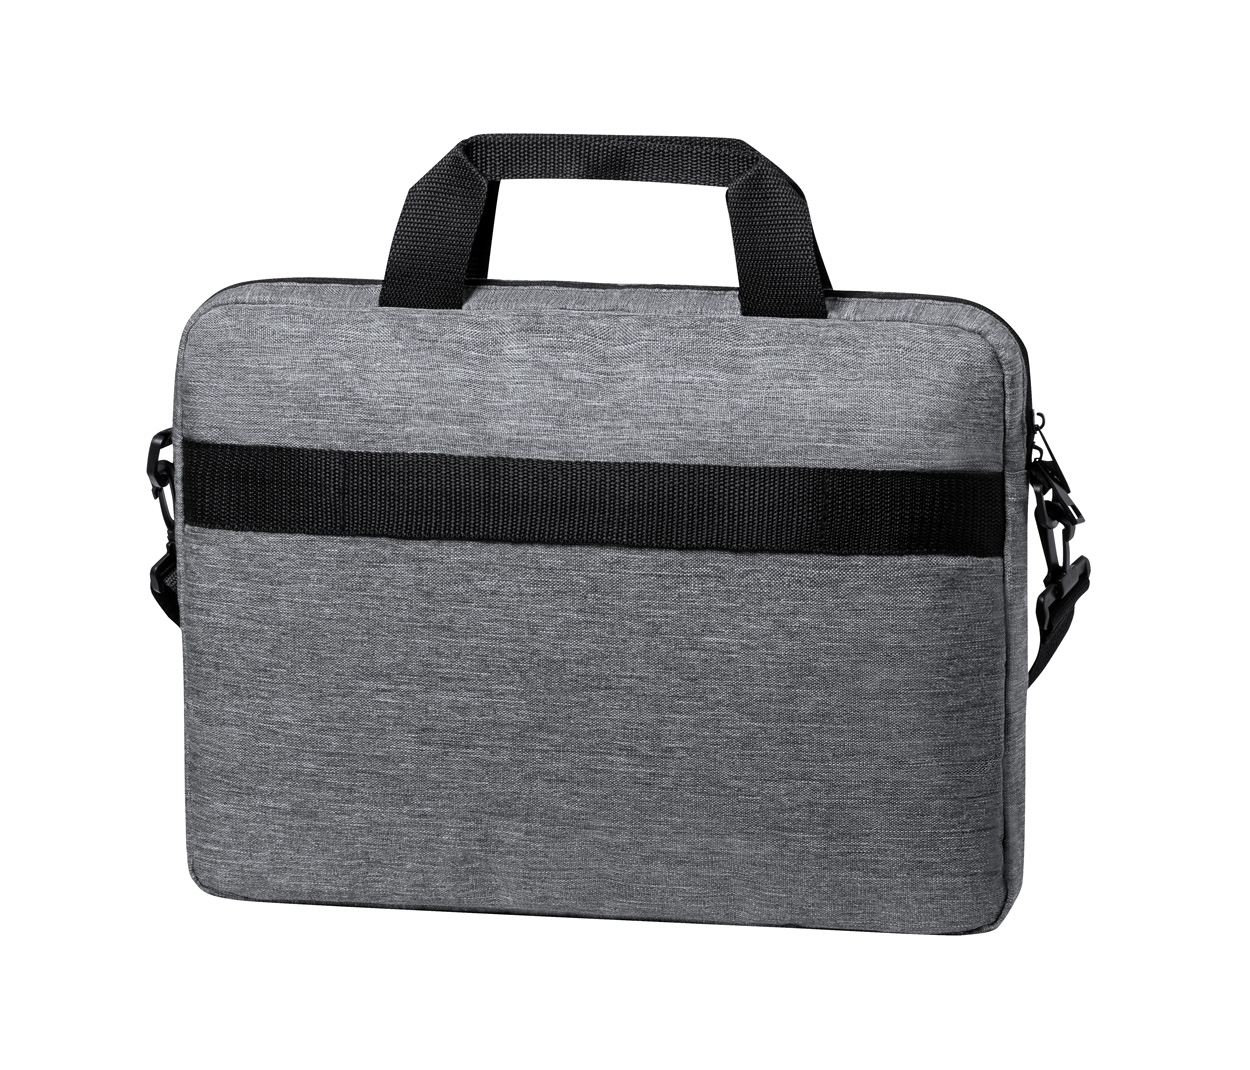 Pirok RPET document bag